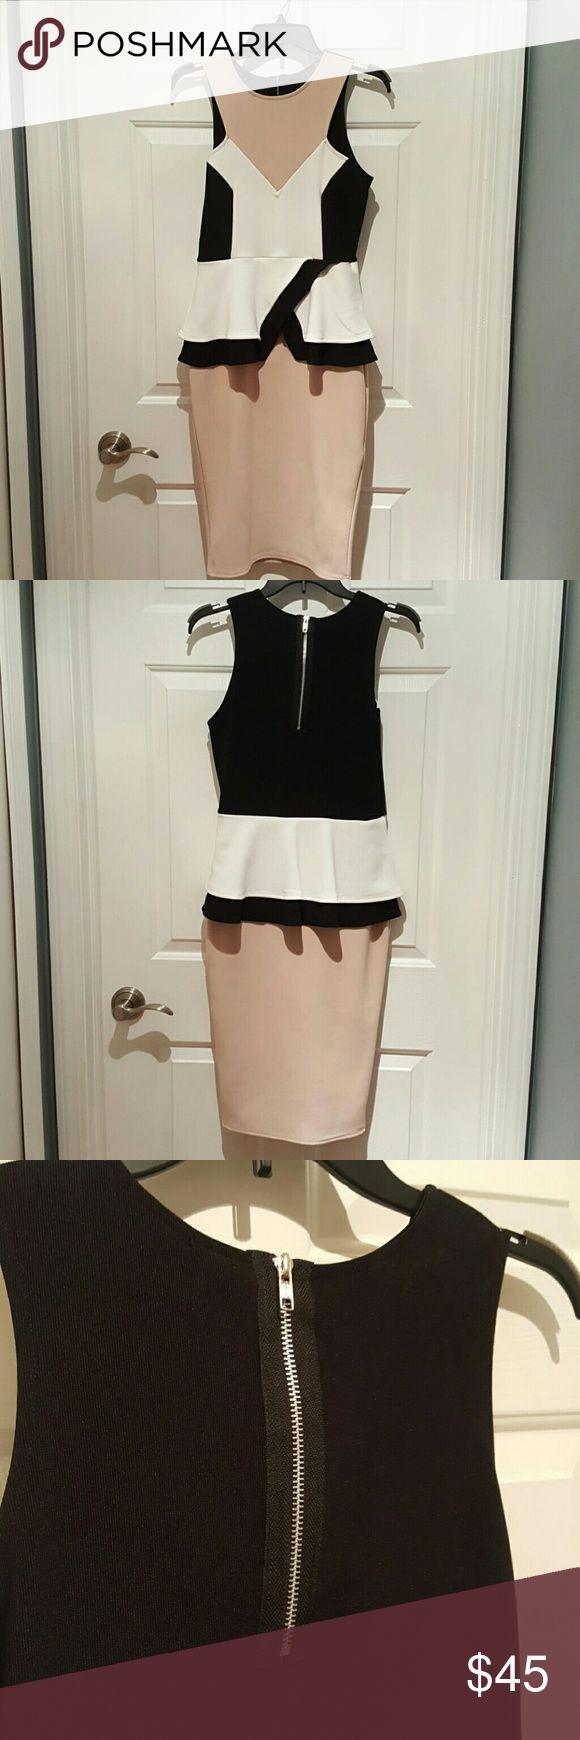 Geometric Peplum Midi Dress Black White Pinkish Taupe Peplum Dress Stretch Material Neverworn Boohoo Dresses Midi